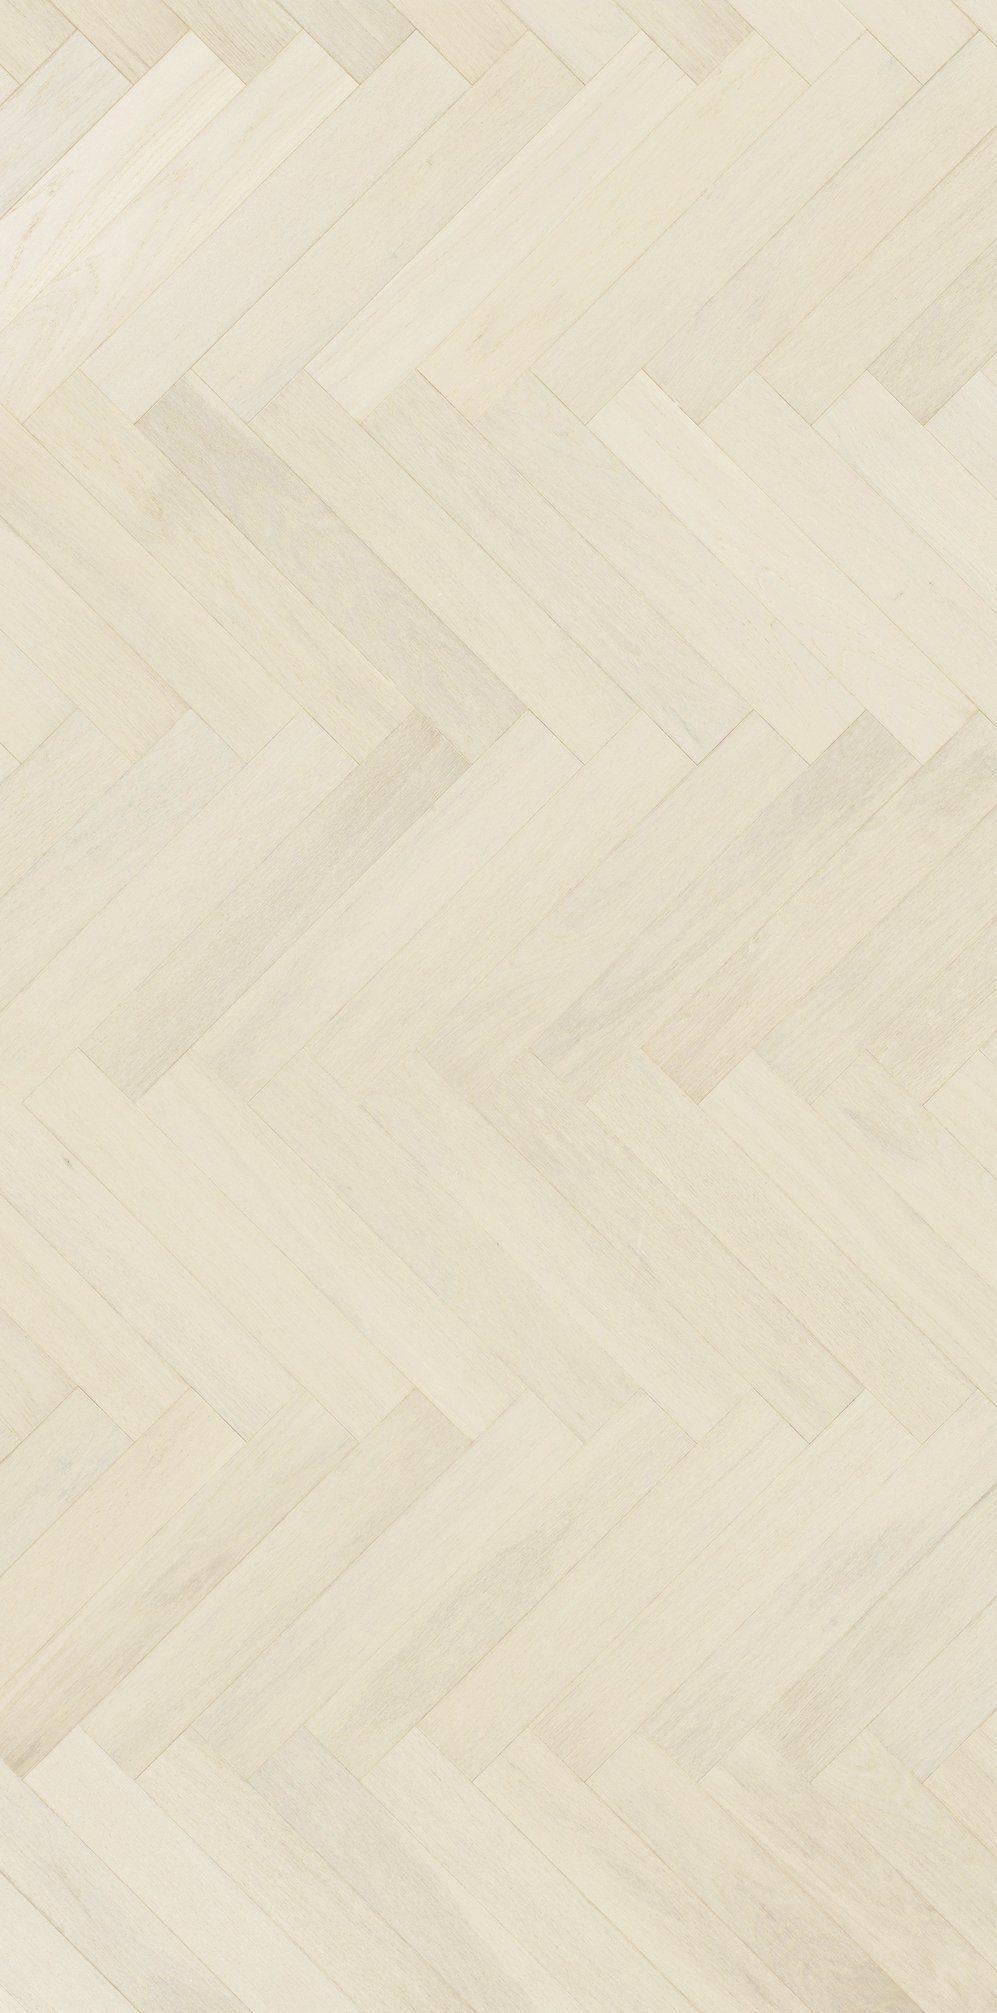 PARADOR Parkett »Trendtime 3 Living - Eiche permutt«, 570 x 95 mm, Stärke: 10,5 mm, 1,08 m²